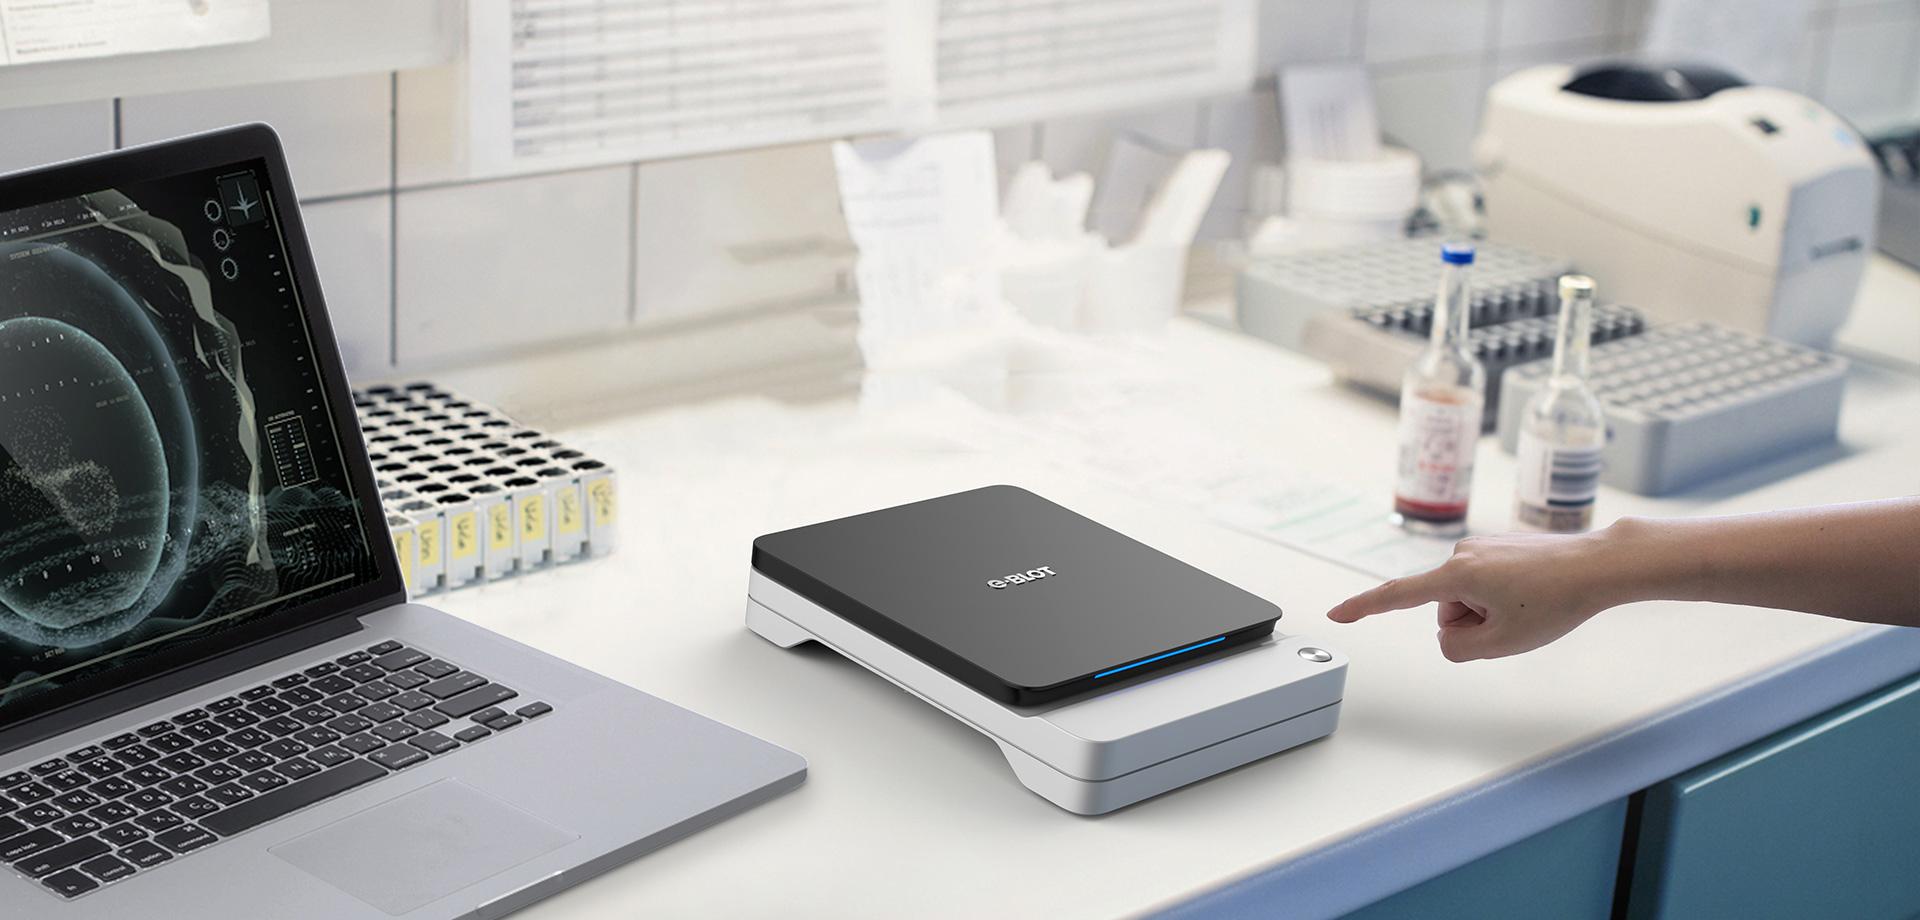 E-blot仪,Western blot成像仪中的Iphone X